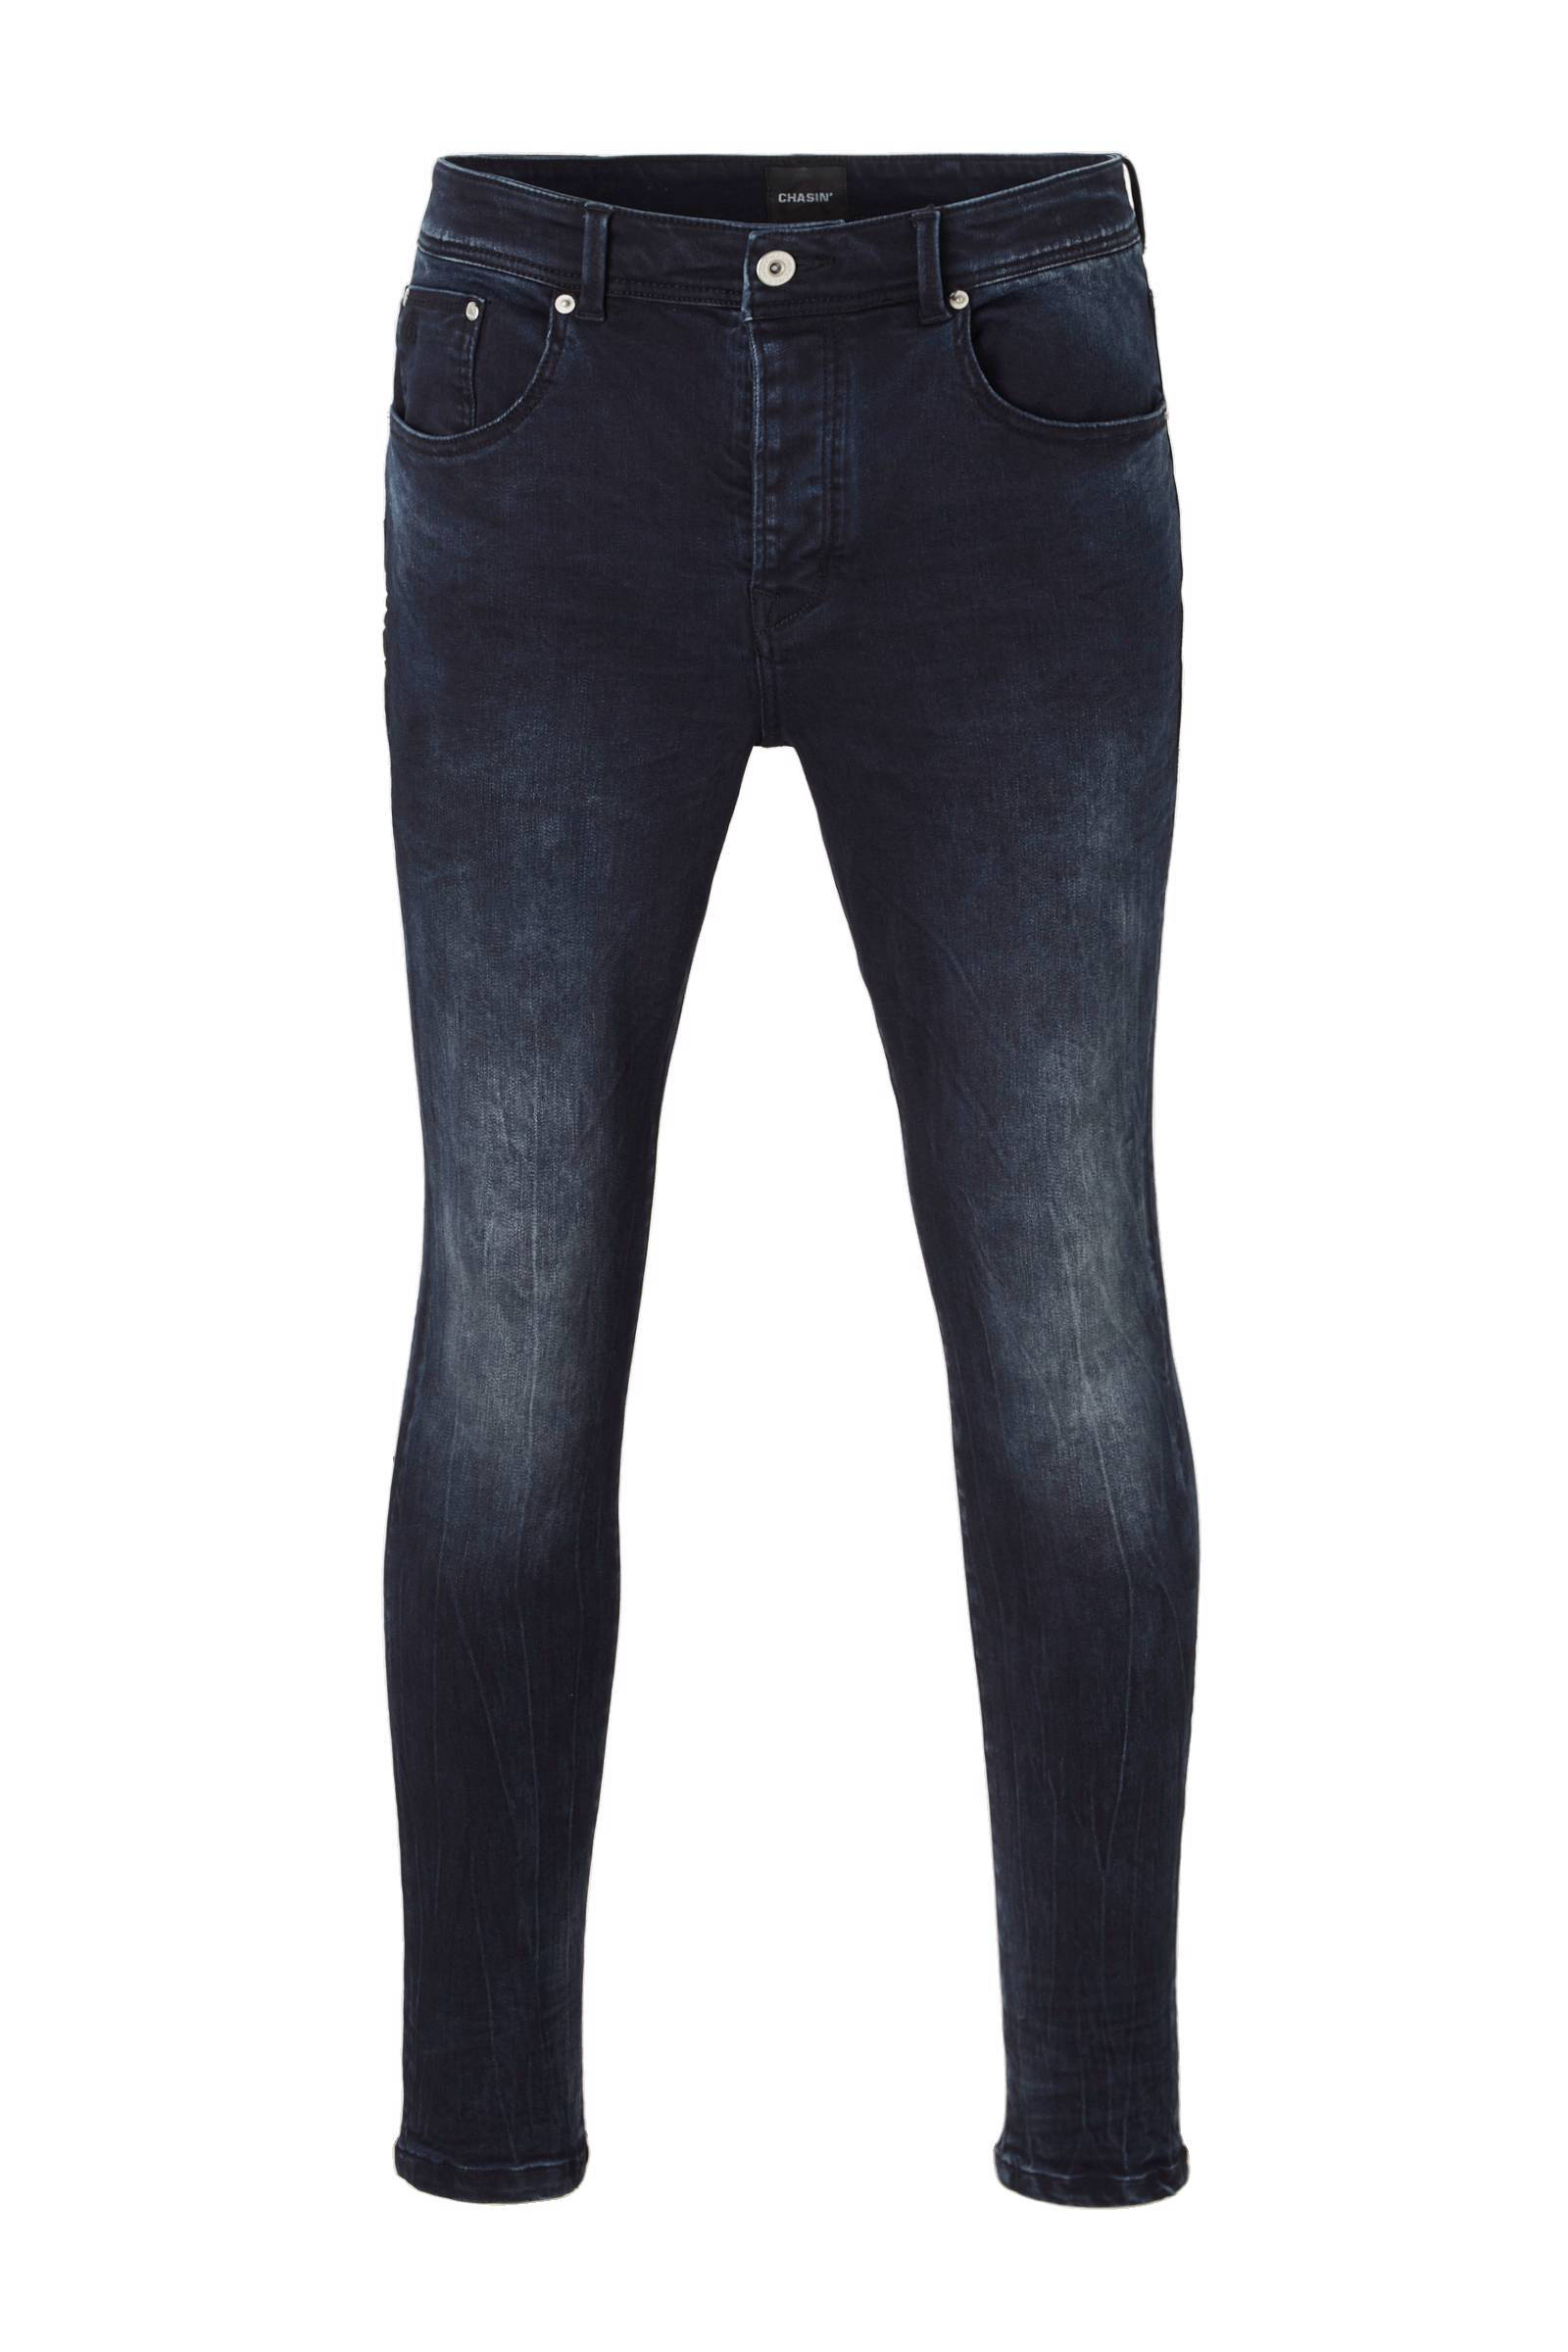 Chasin' Iggy skinny fit jeans (heren)